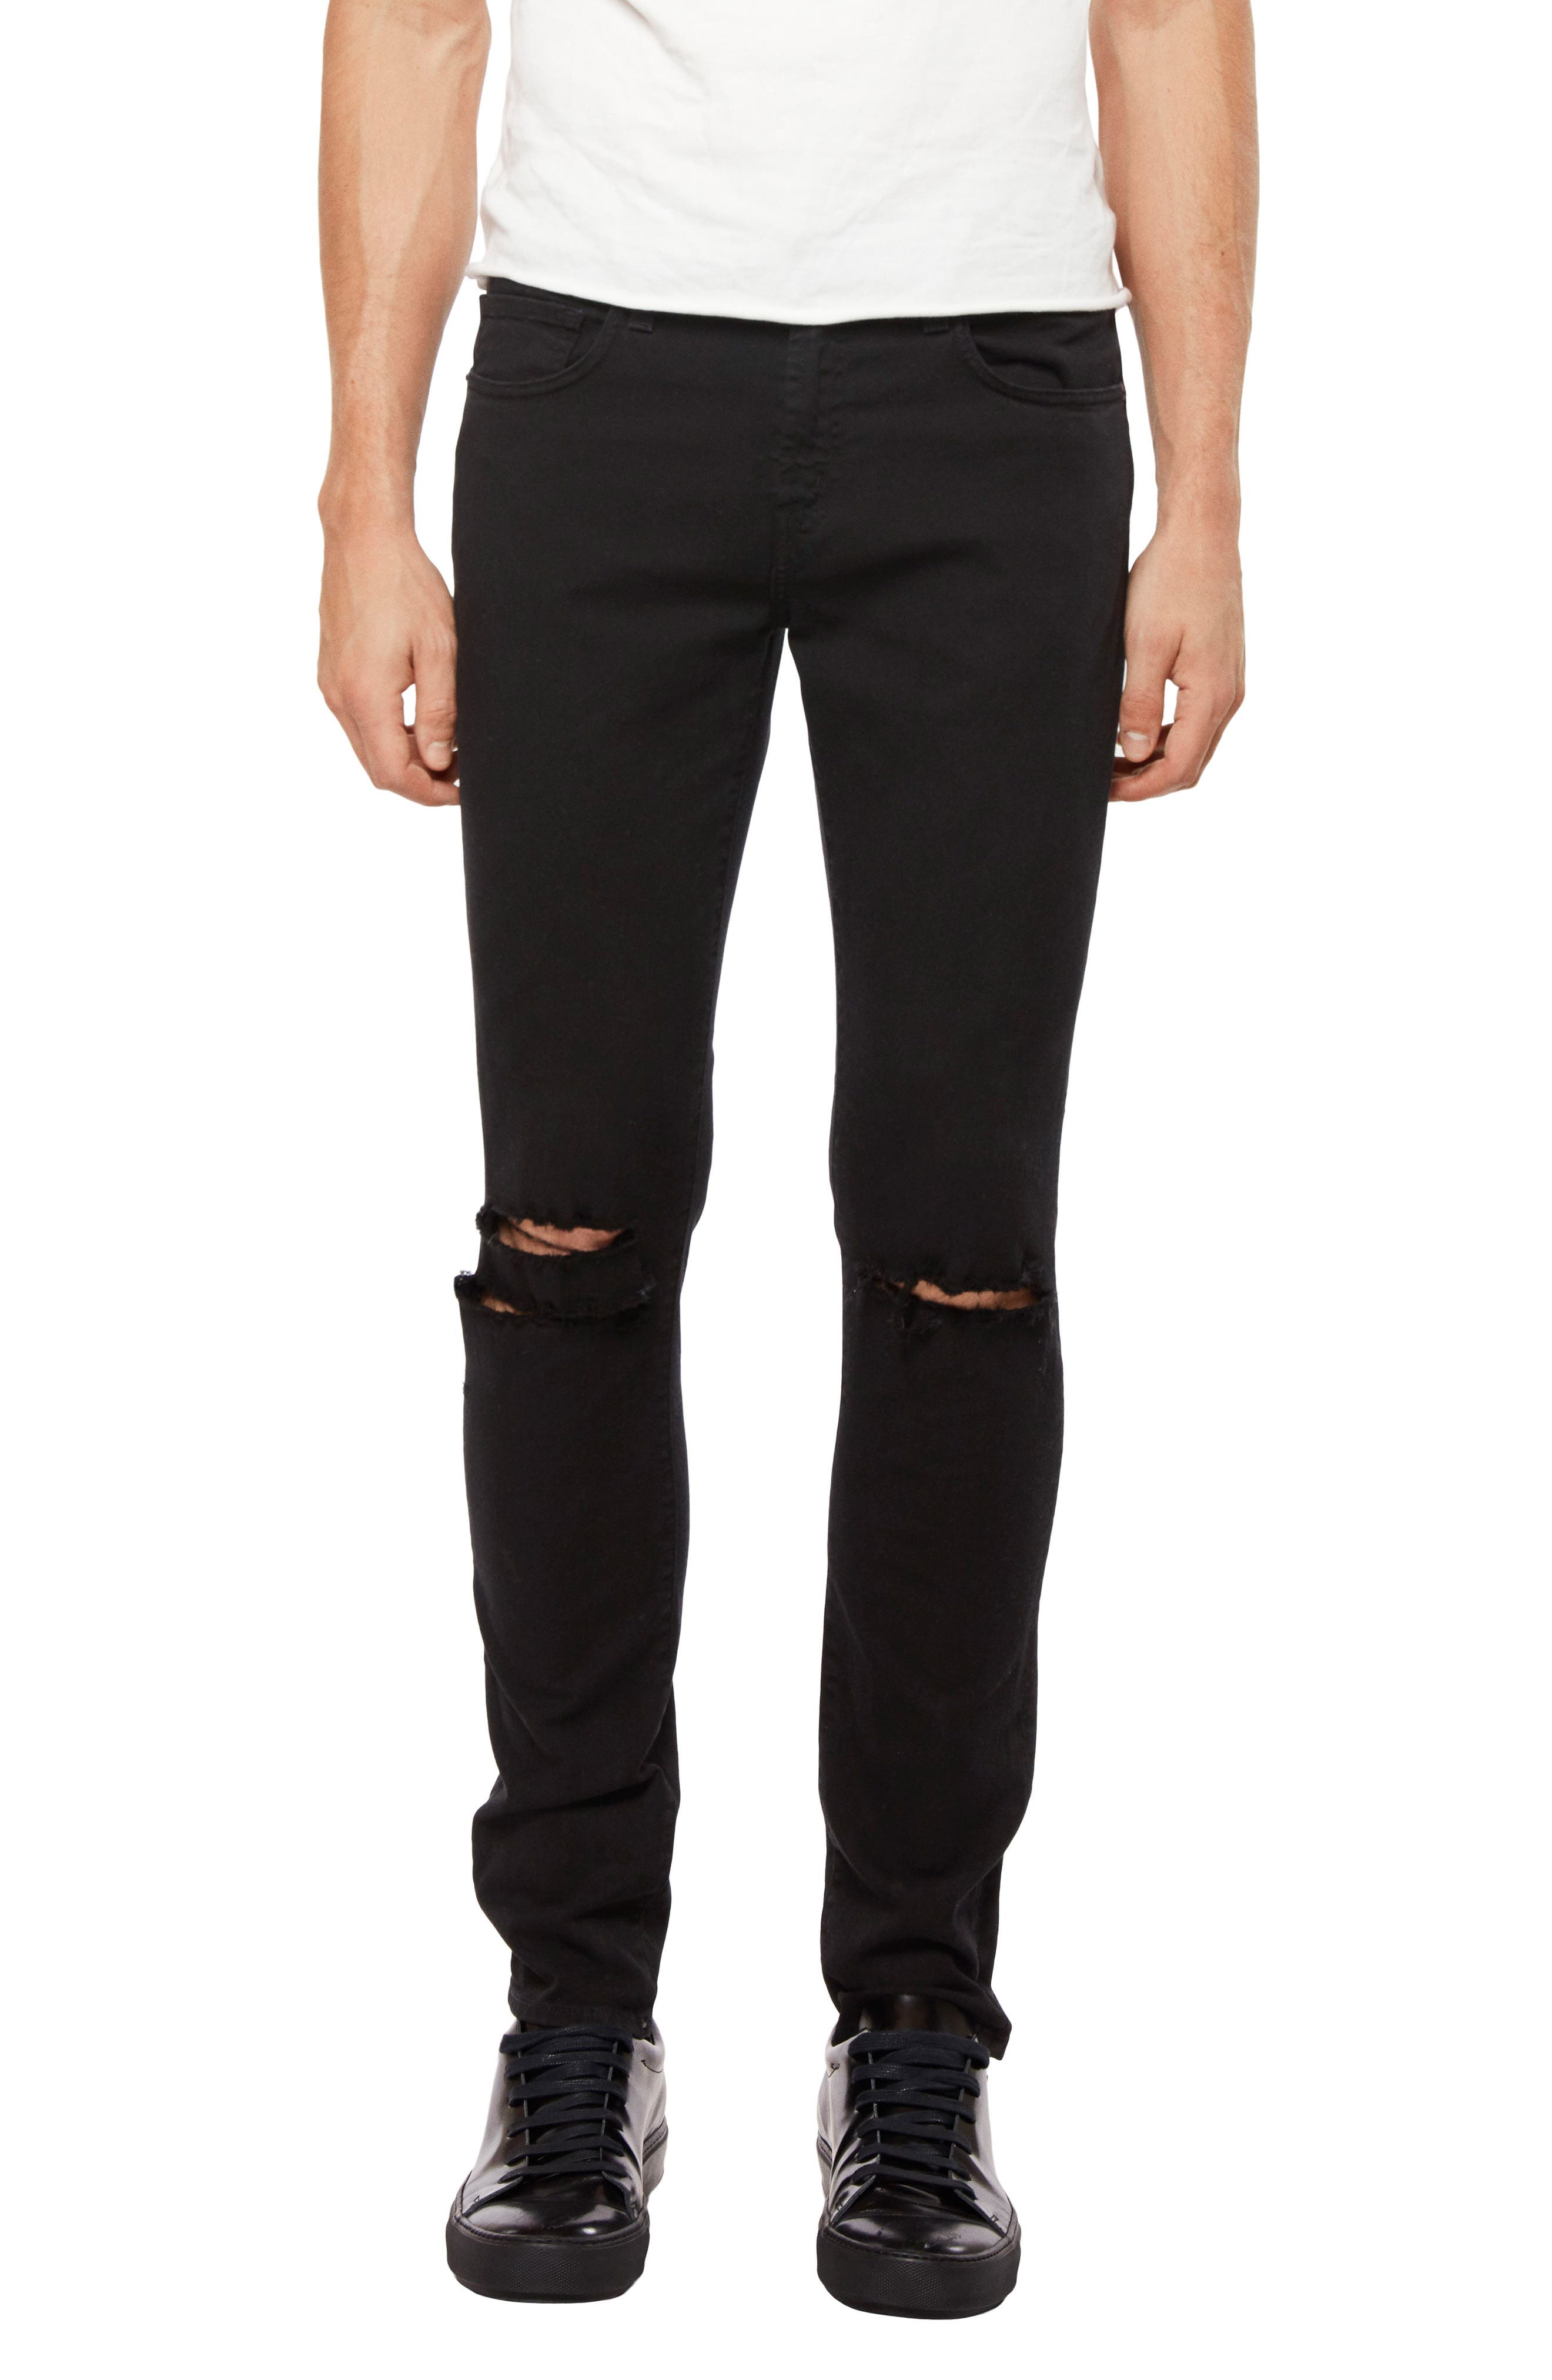 Mick Skinny Fit Jeans,                             Main thumbnail 1, color,                             LINCOLN OAK